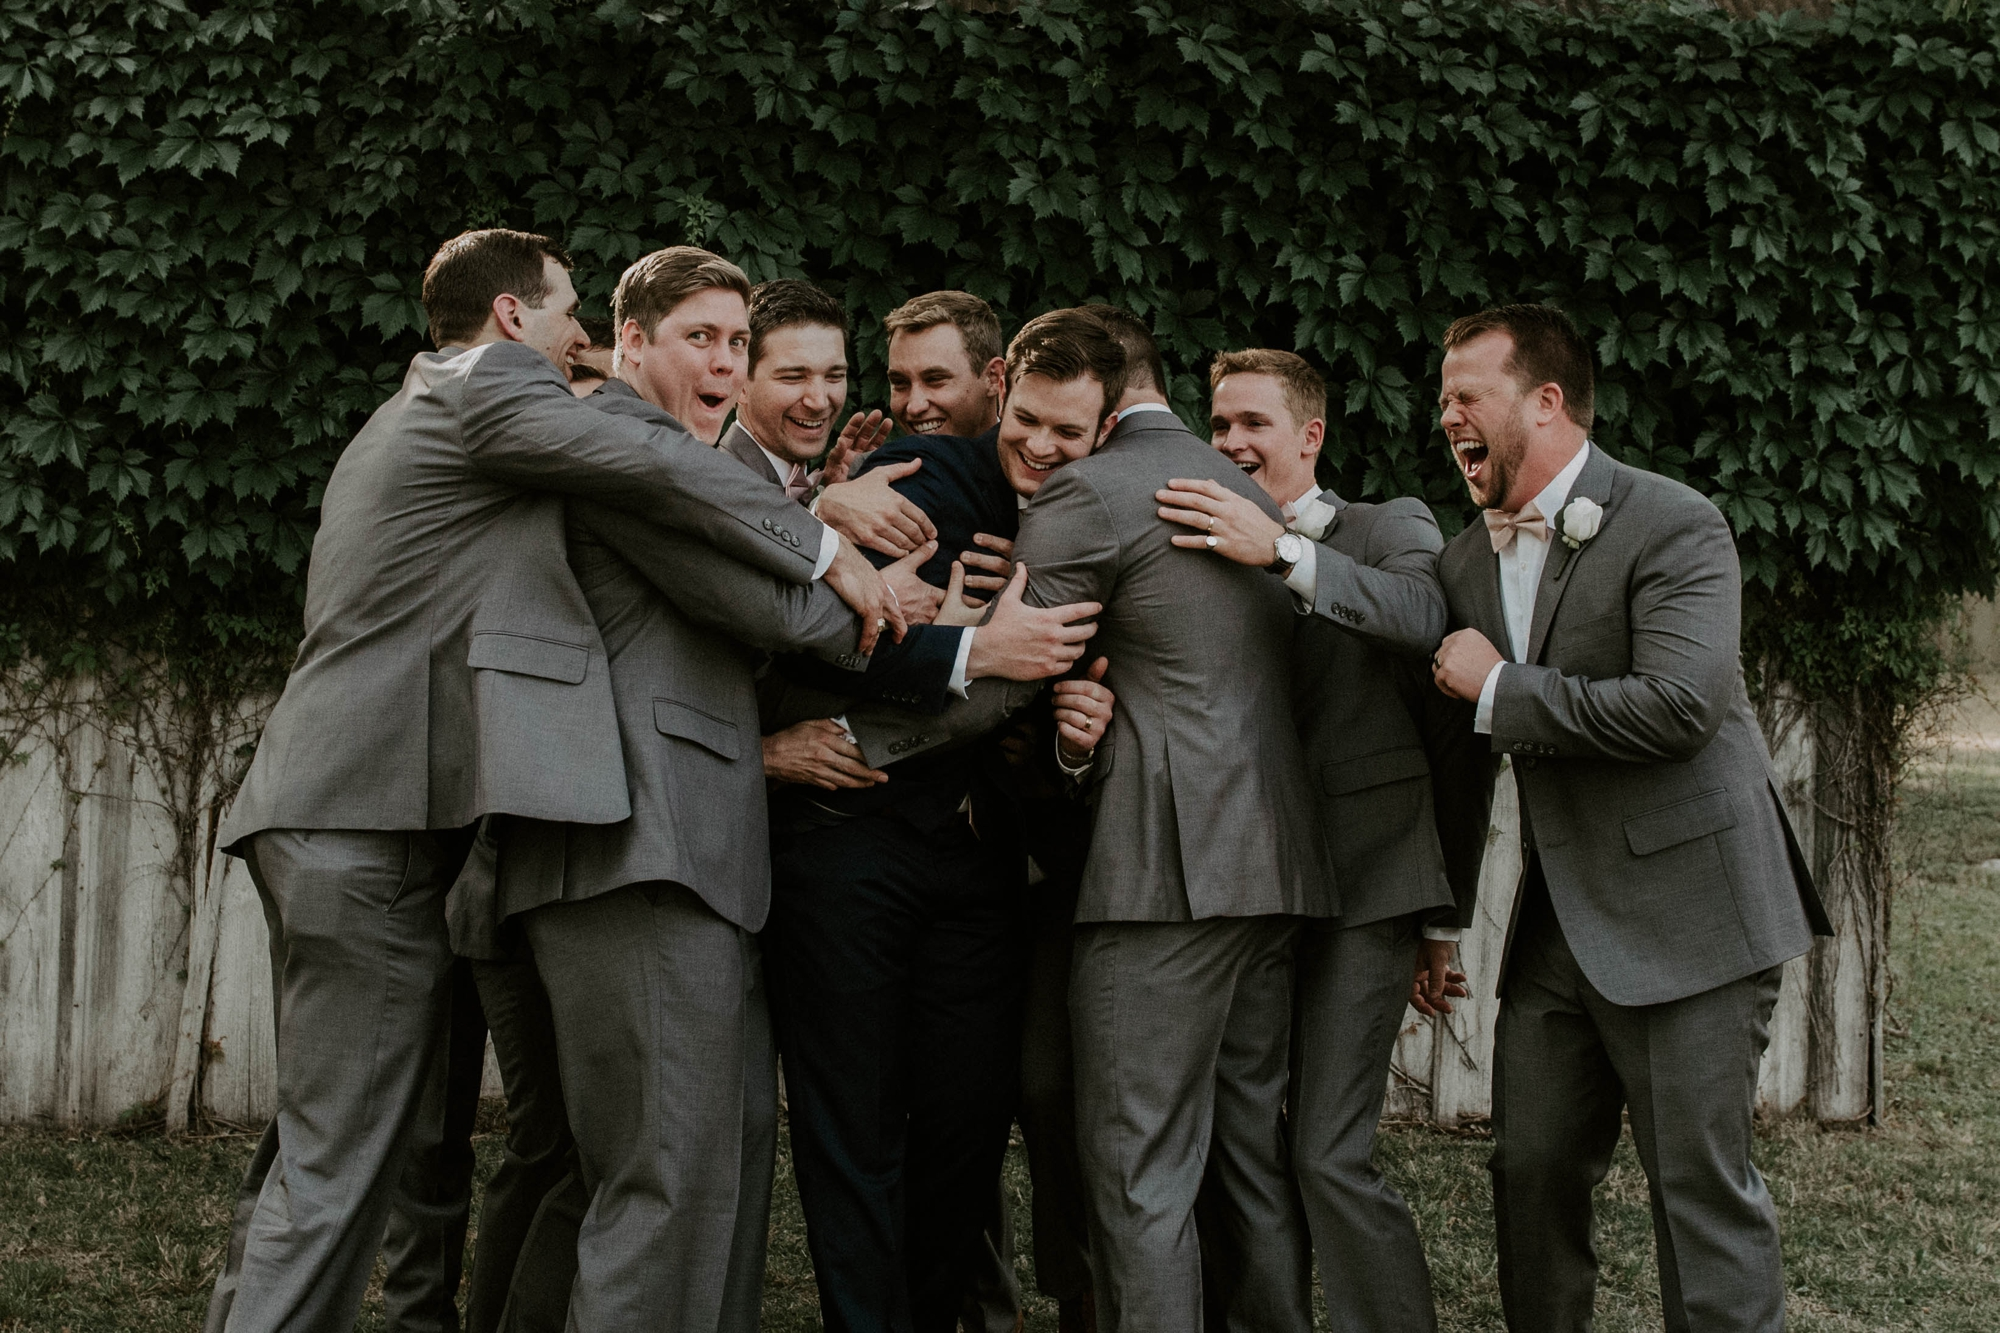 austin-texas-wedding-photography-1778-photographie-8.jpg